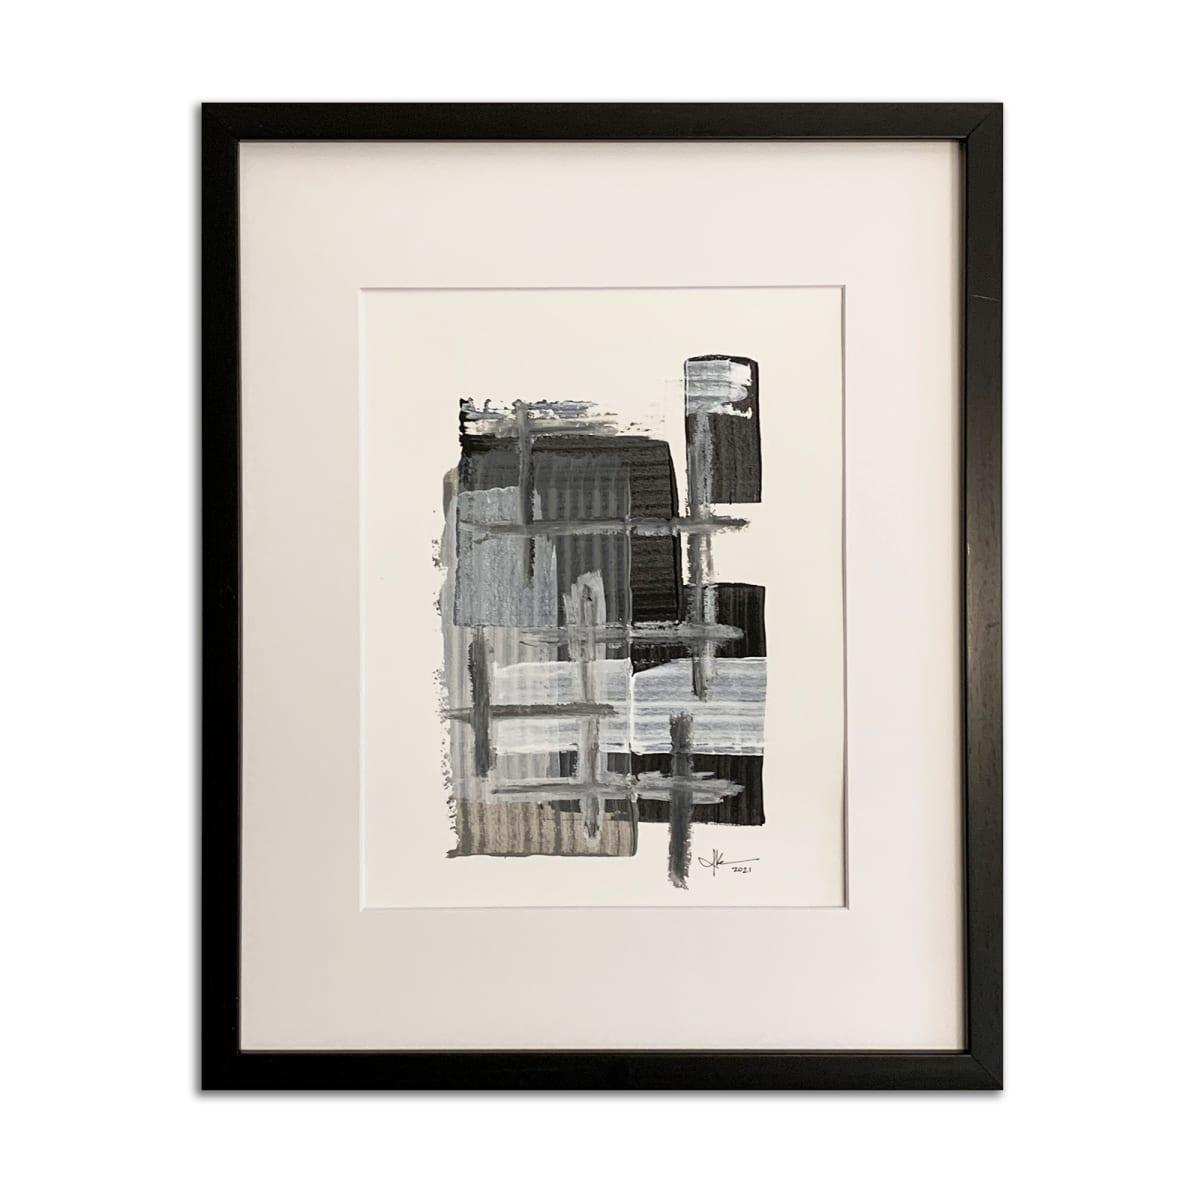 Untitled 58 by J. Kent Martin